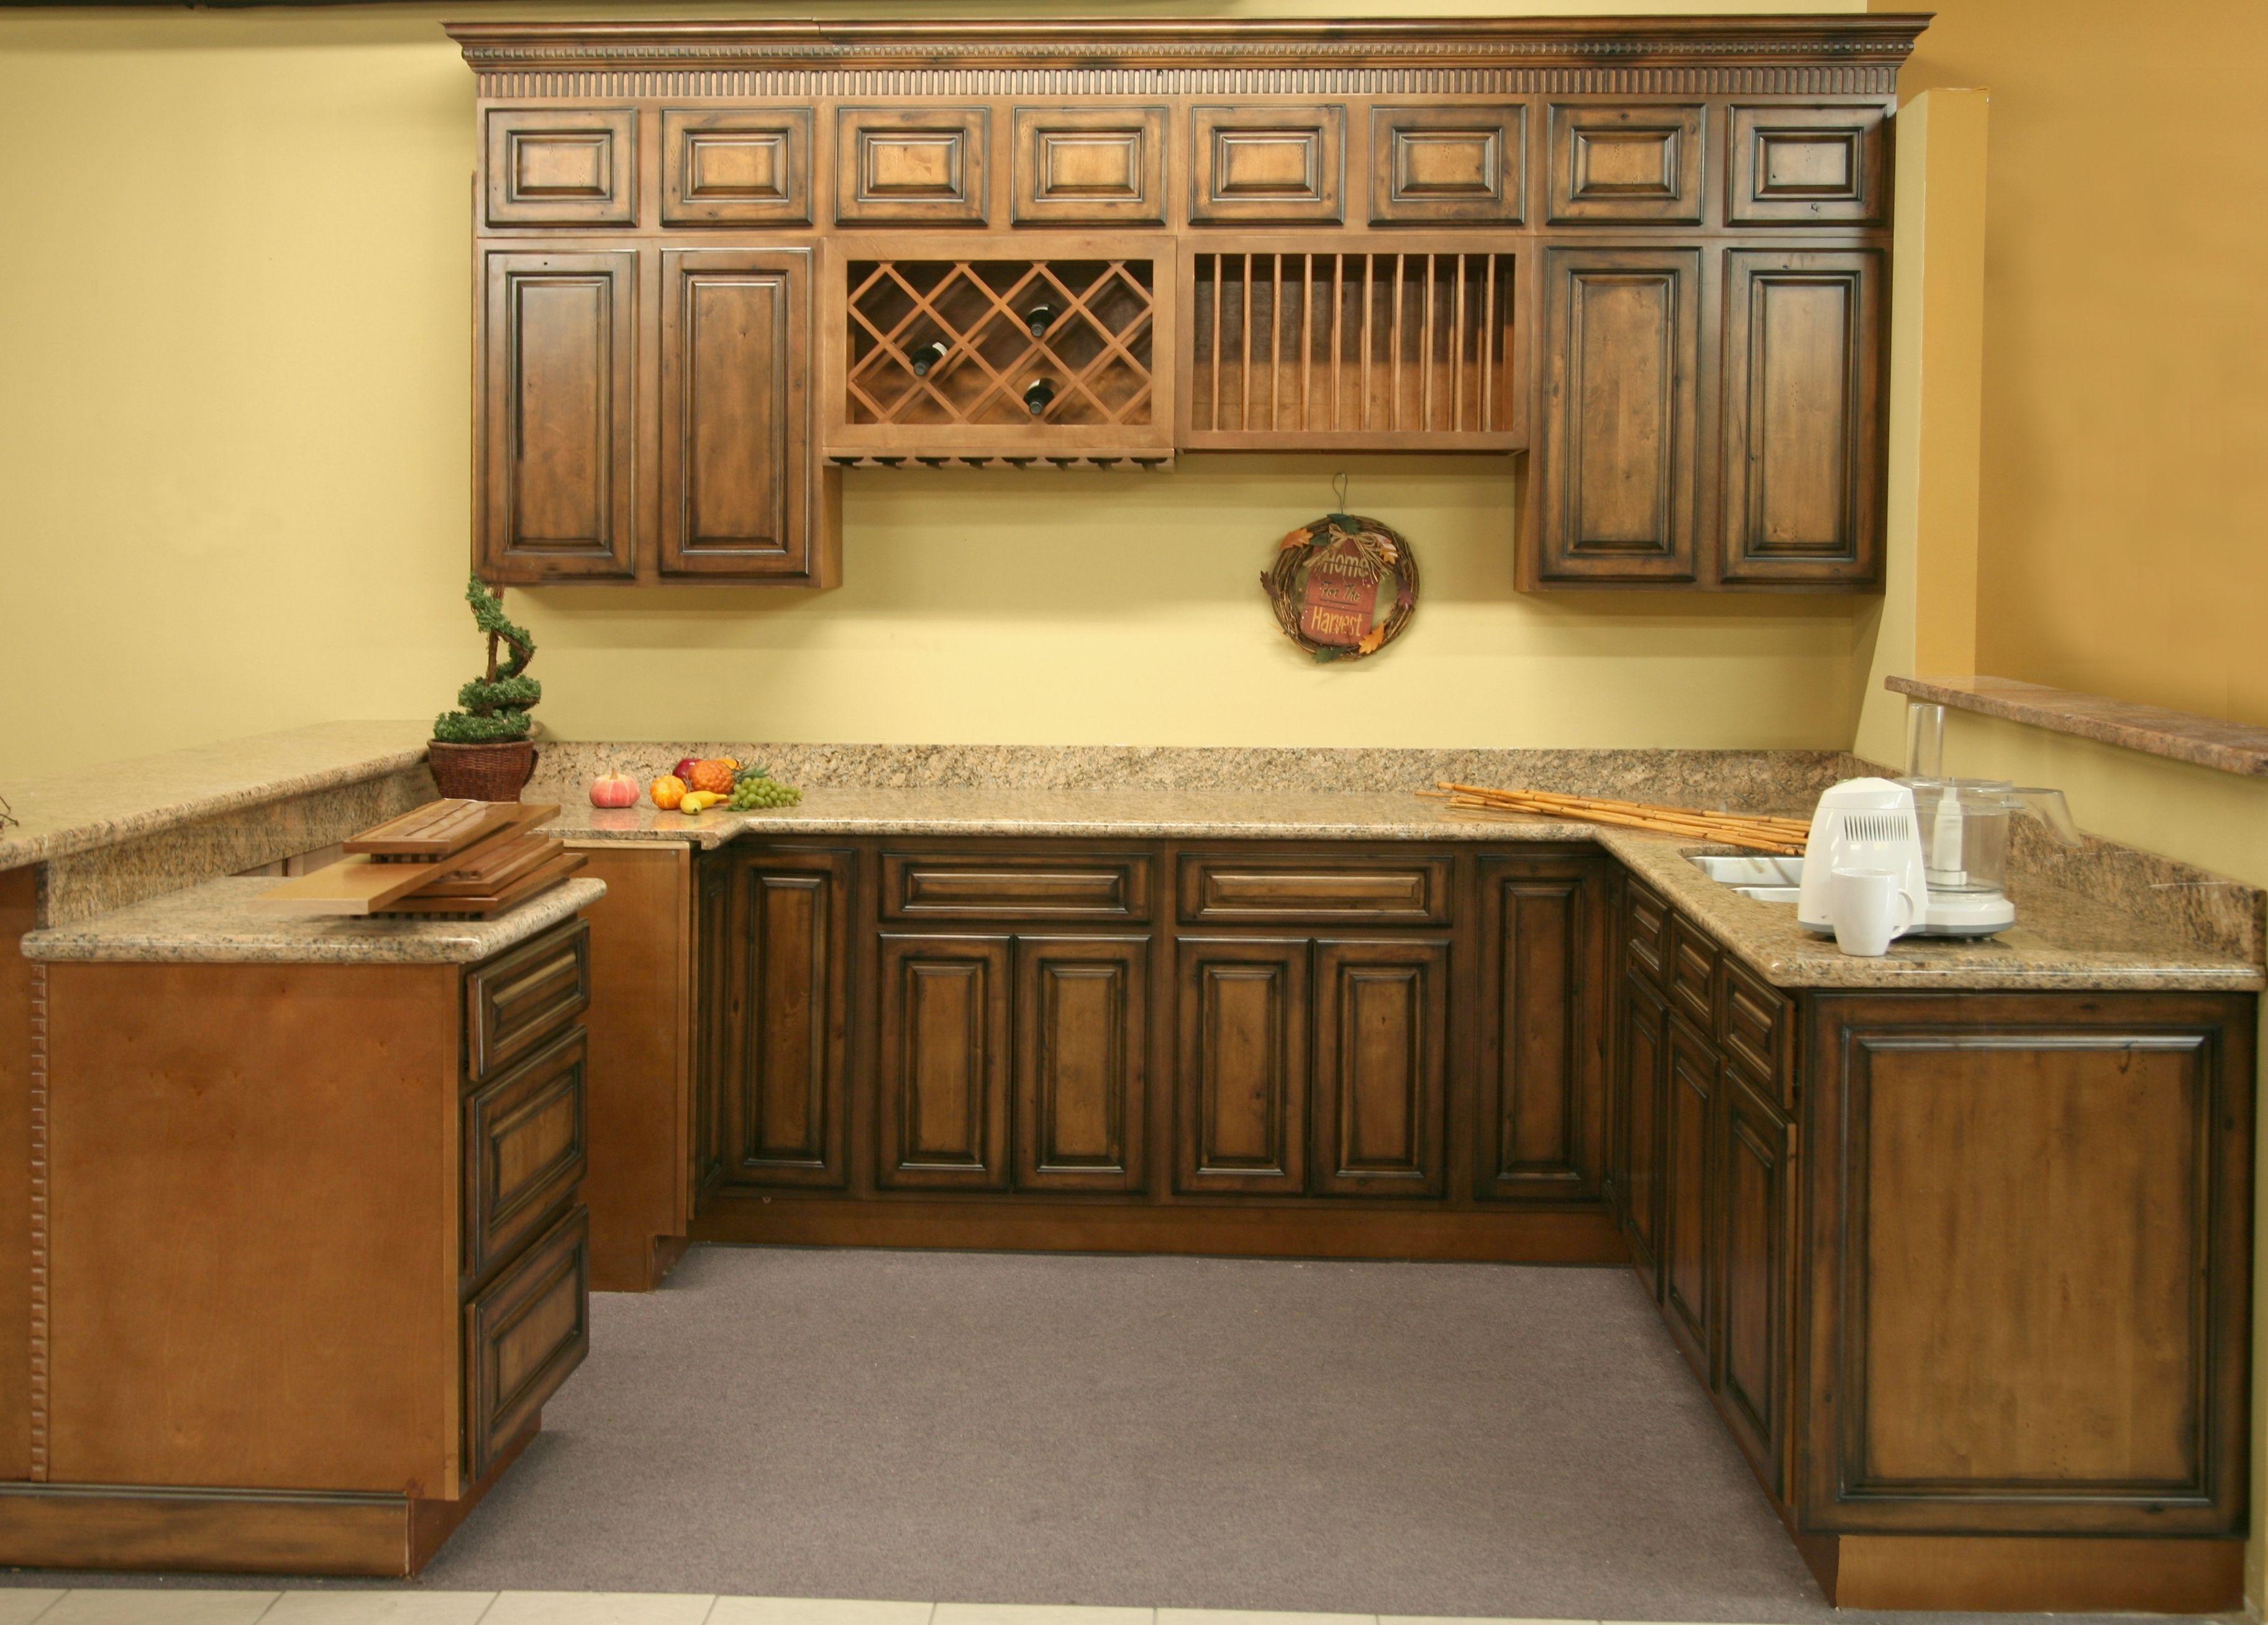 Pecan Stained Kitchen Cabinets Modern Kitchen Cabinets Tuscan Kitchen Maple Kitchen Cabinets